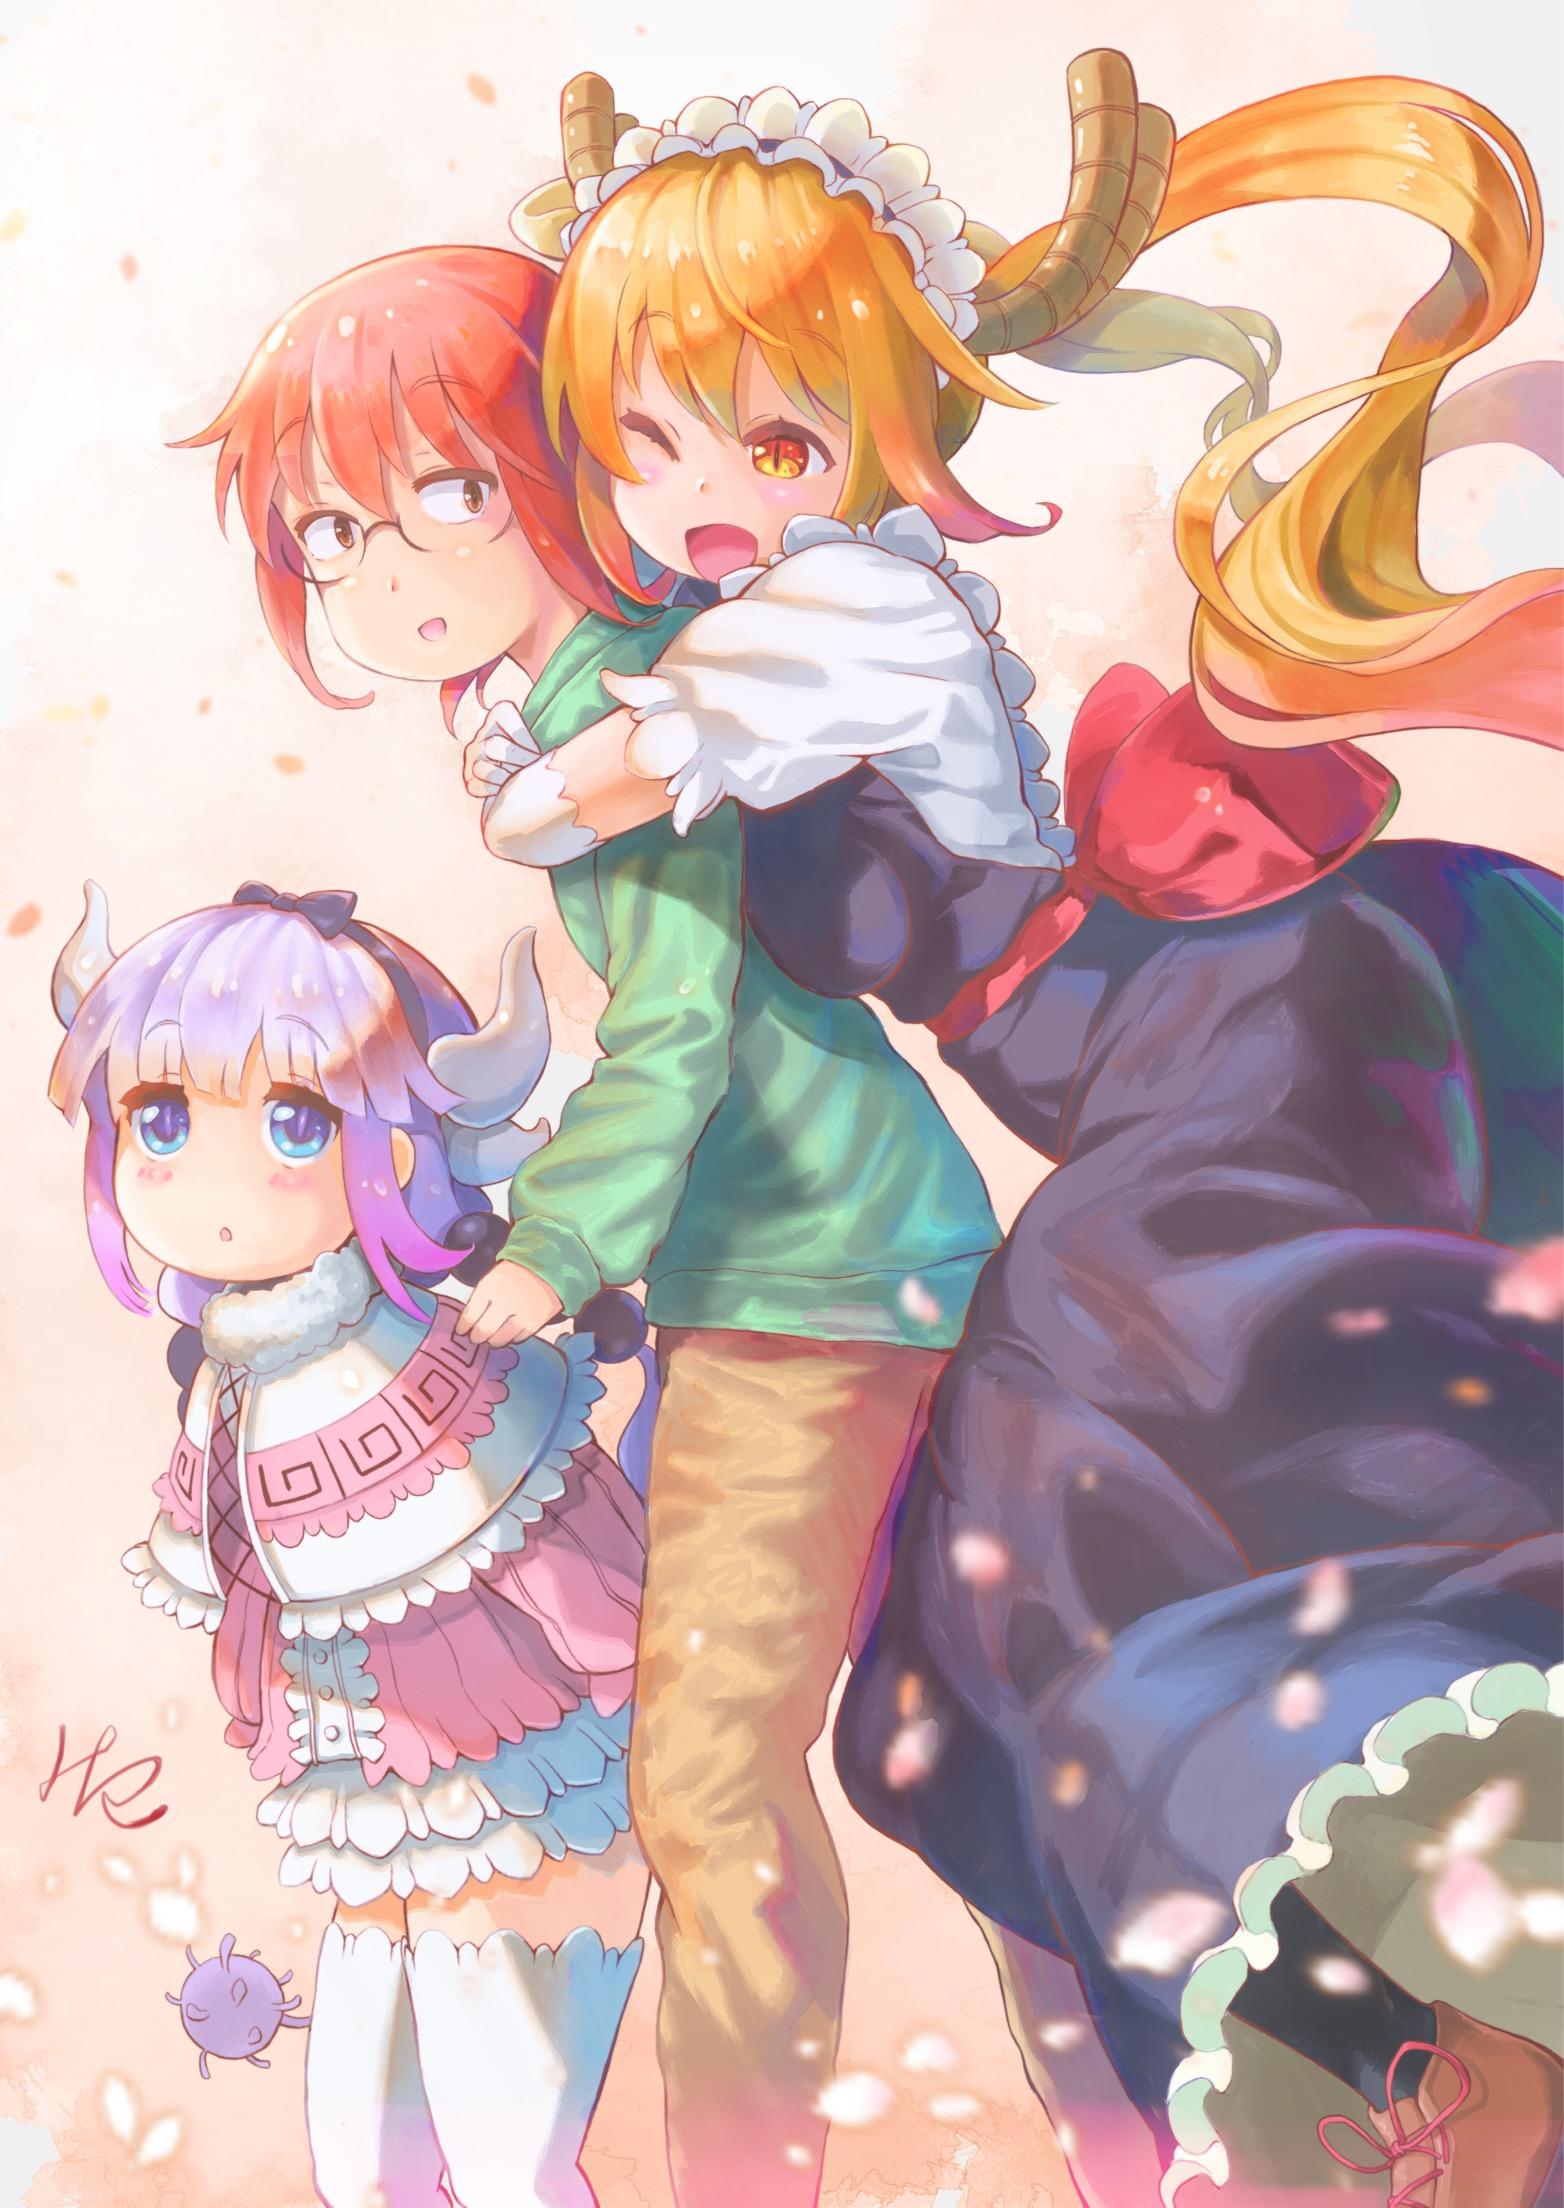 Miss Kobayashi's Dragon Maid Art - ID: 104234